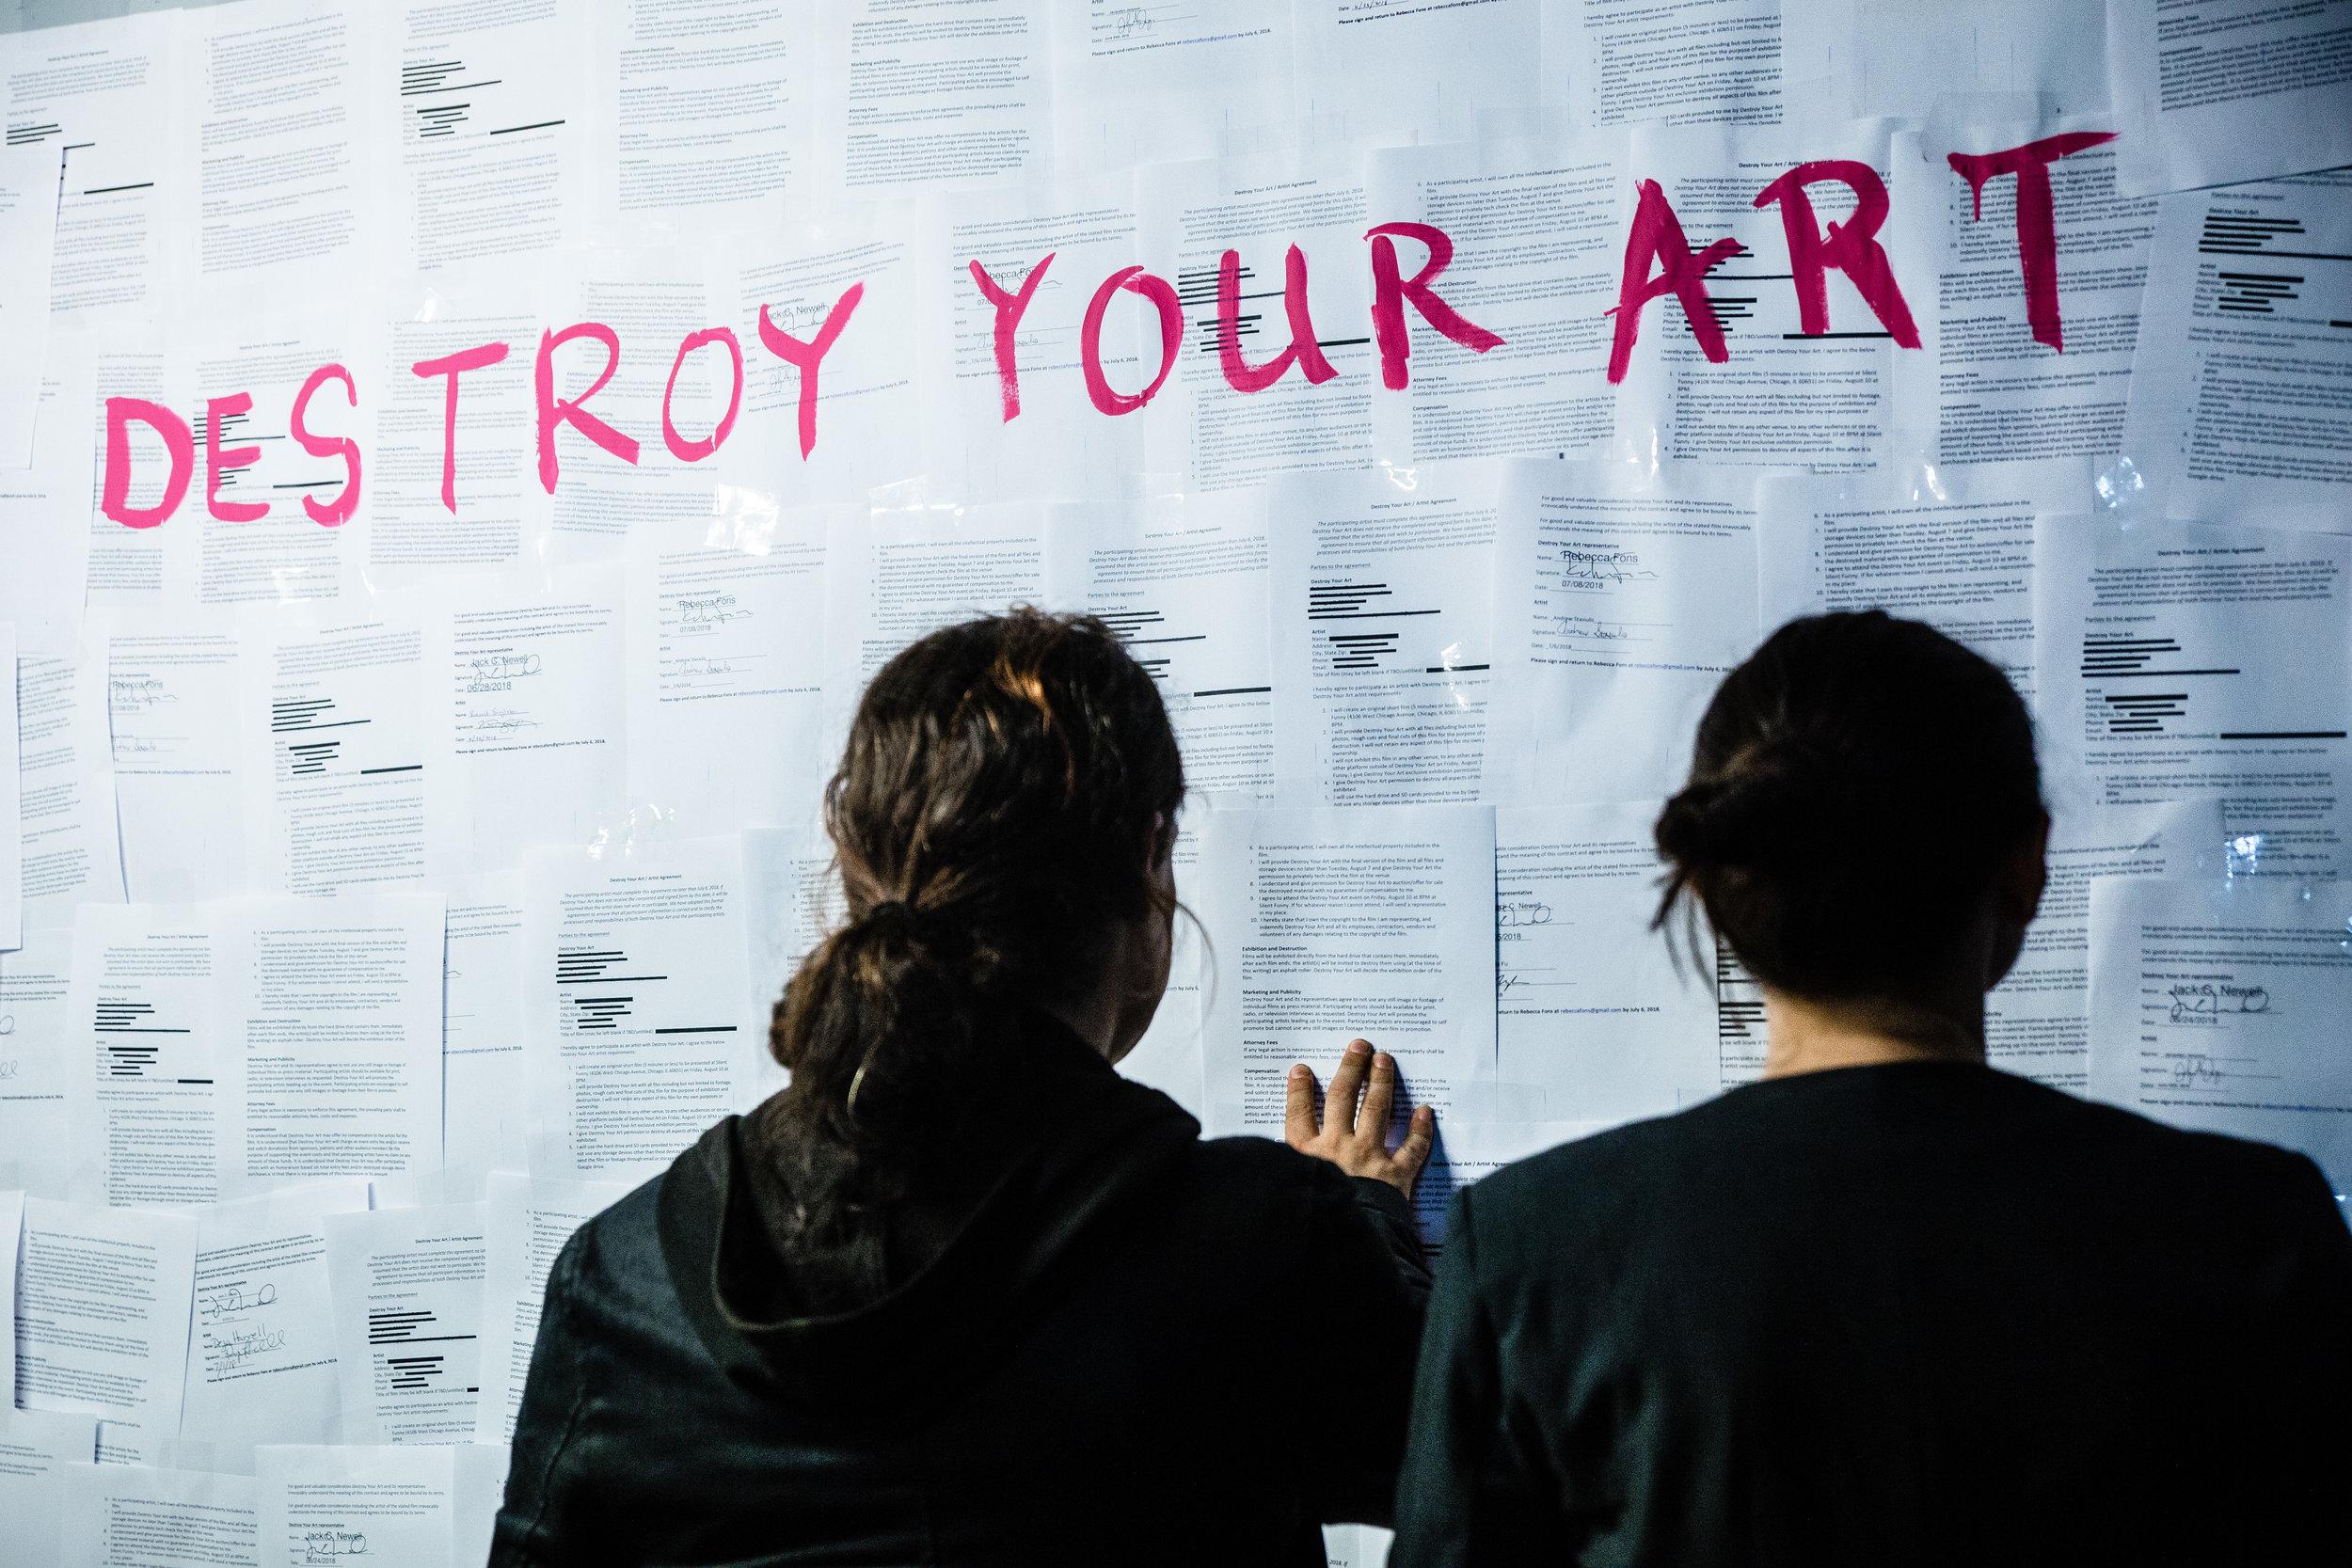 Destroy Your Art 08-10-18 timothymschmidt-1965.jpg